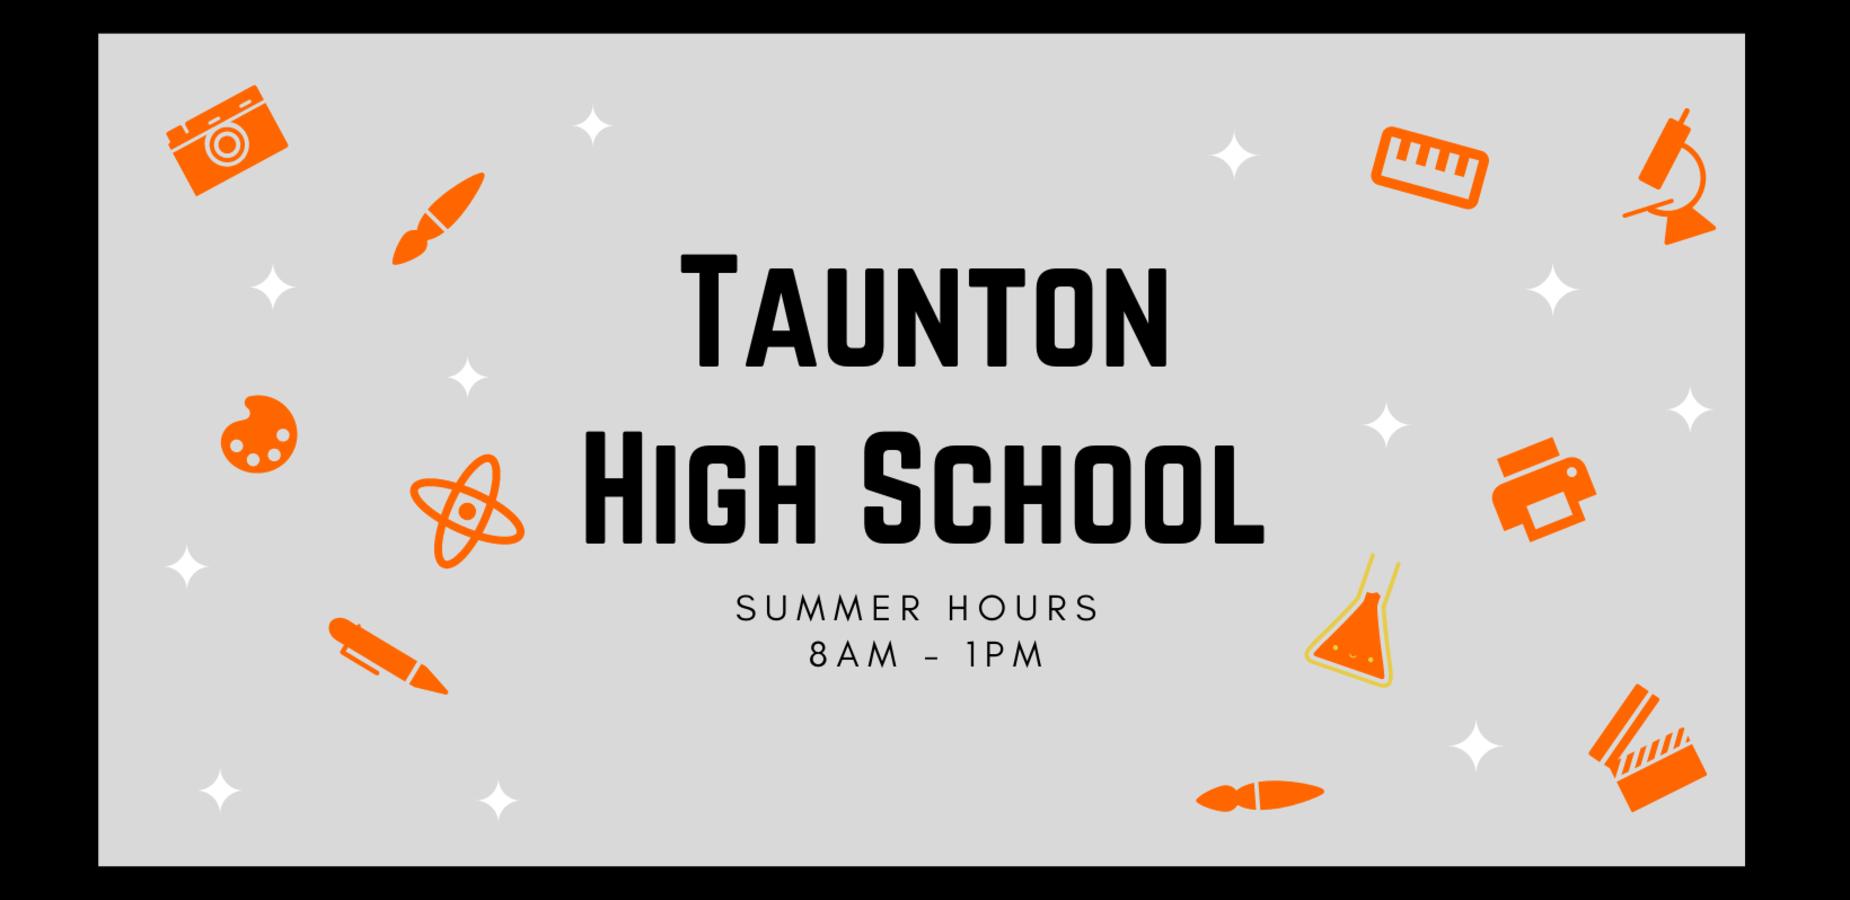 Taunton High School Summer Hours 8AM-1PM